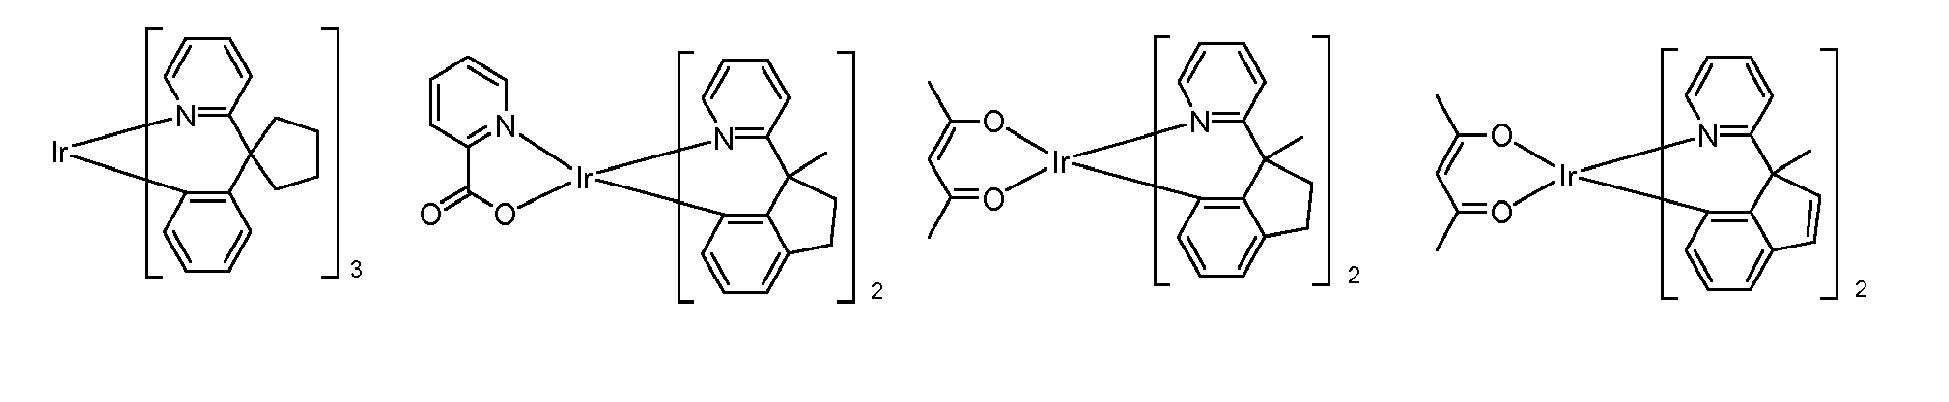 Figure imgb0358